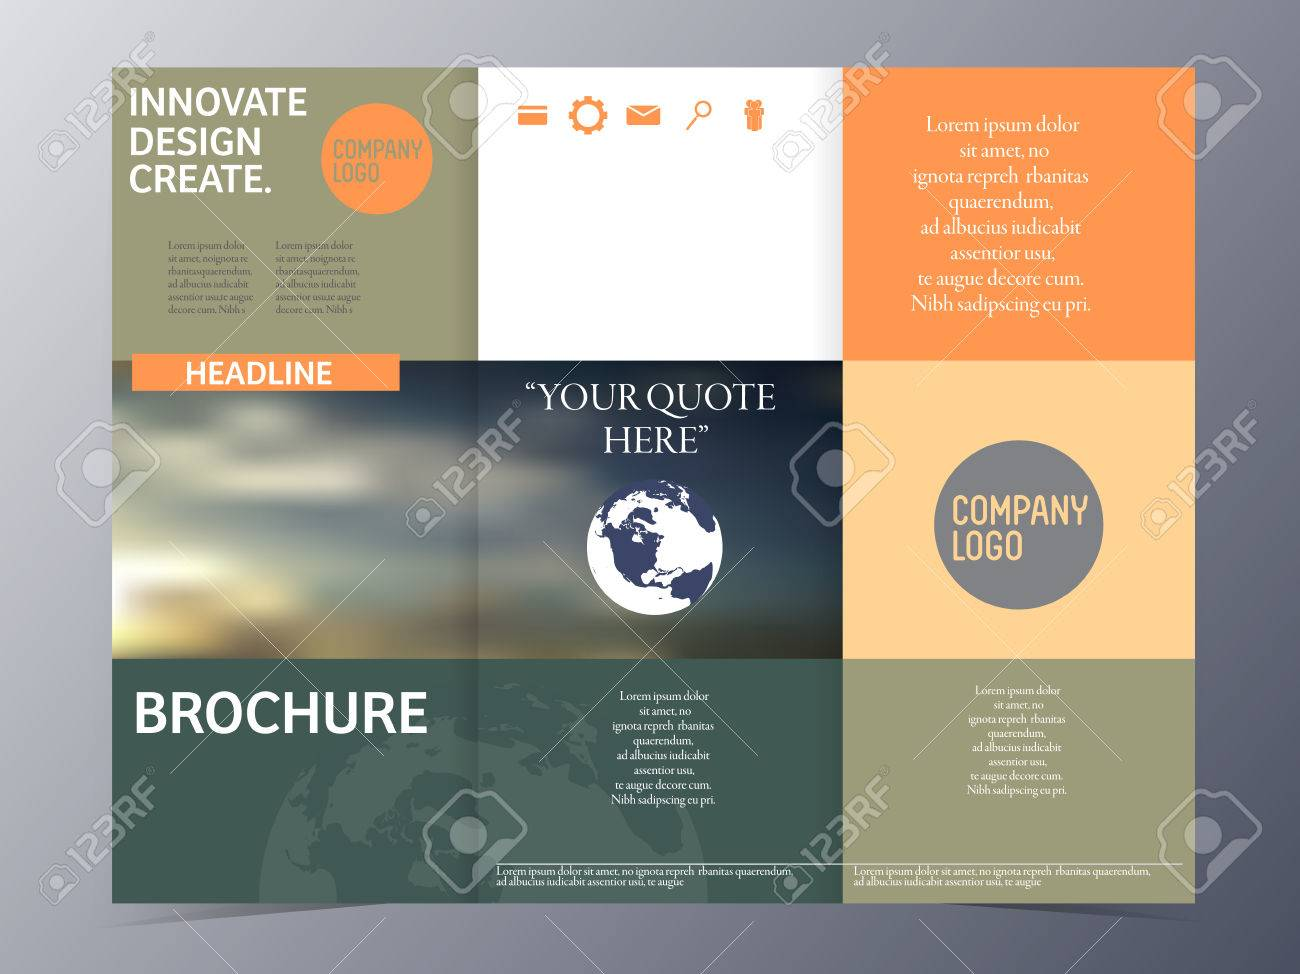 Brochure Template Trifold Vector Illustration For Use As Product – Product Brochure Template